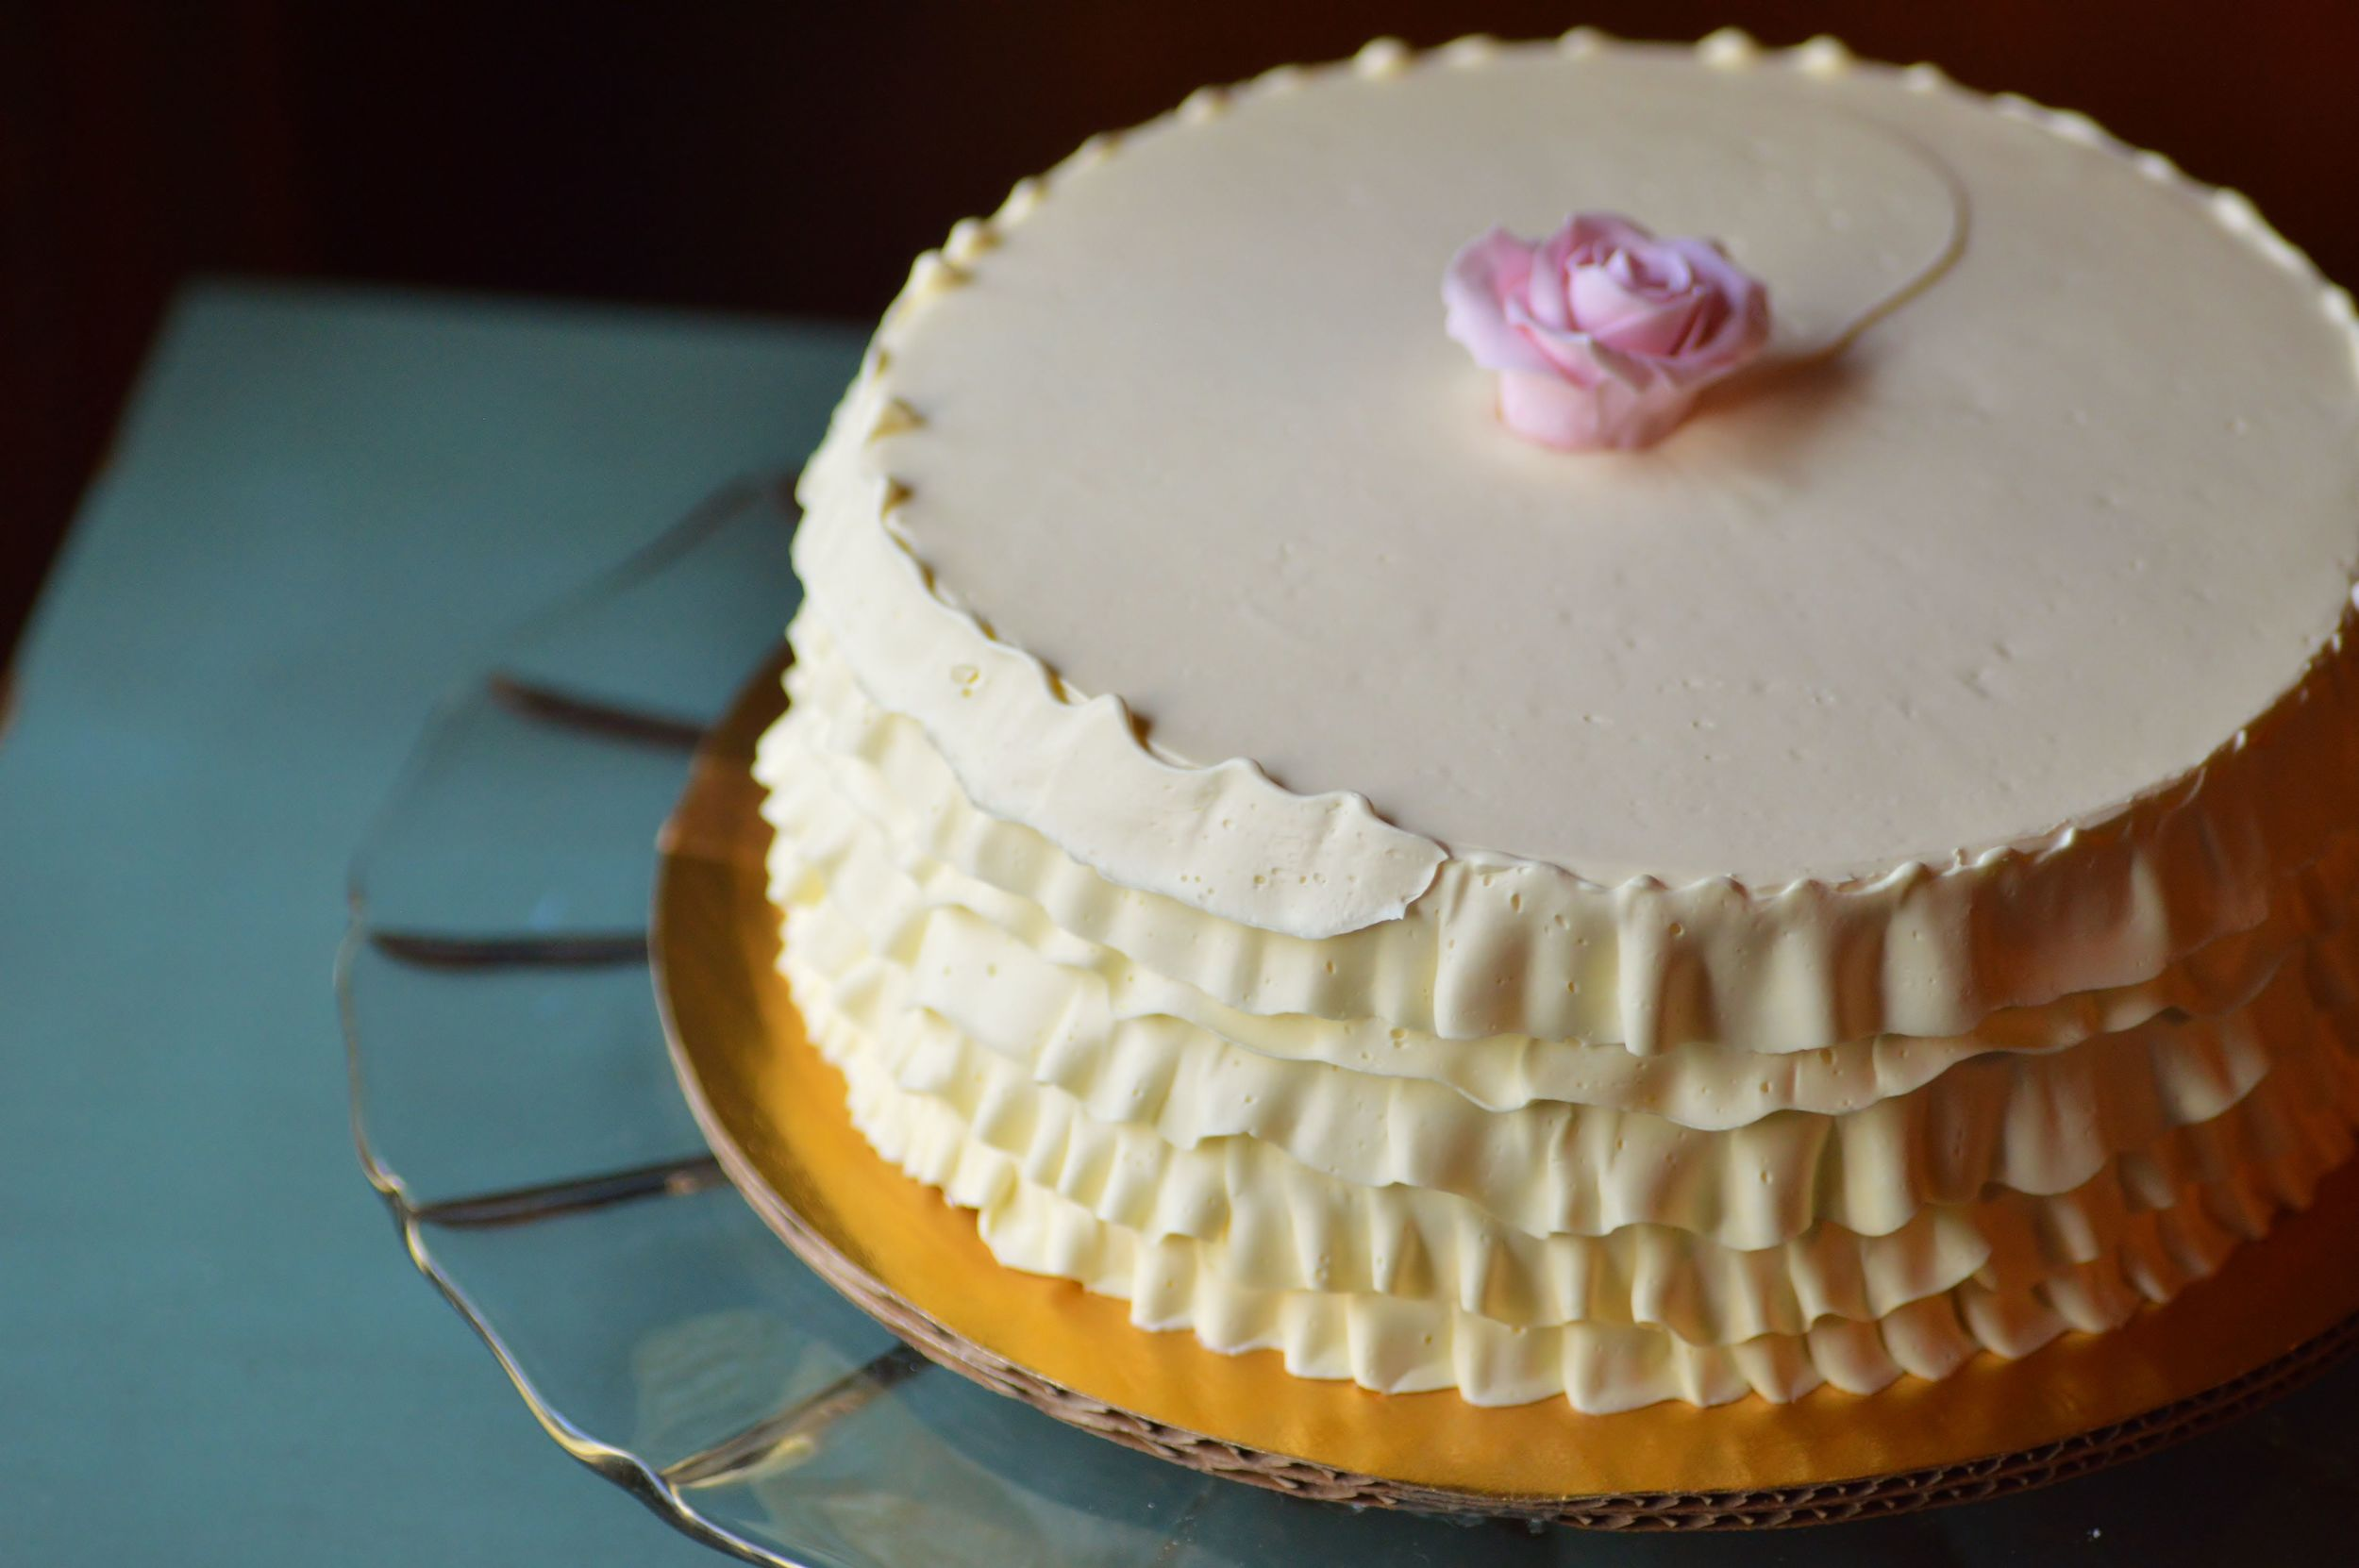 Buttercream ruffle cake with an edible rose